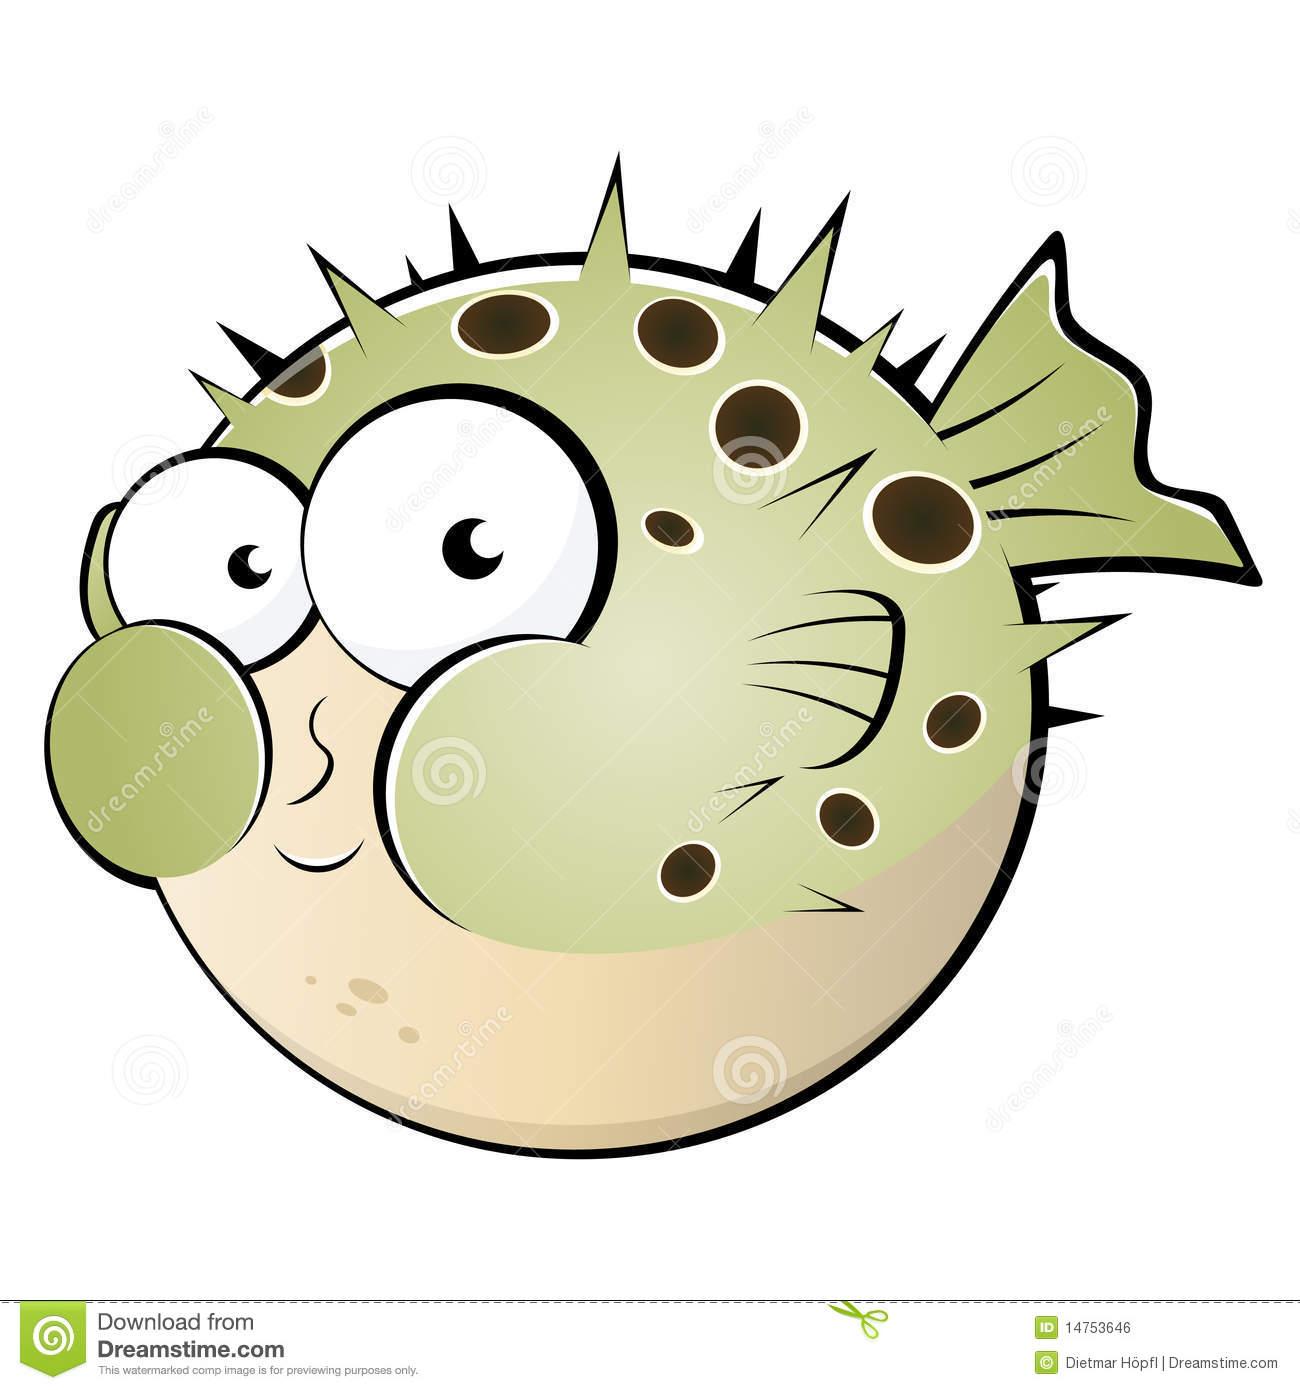 Blowfish clipart #7, Download drawings